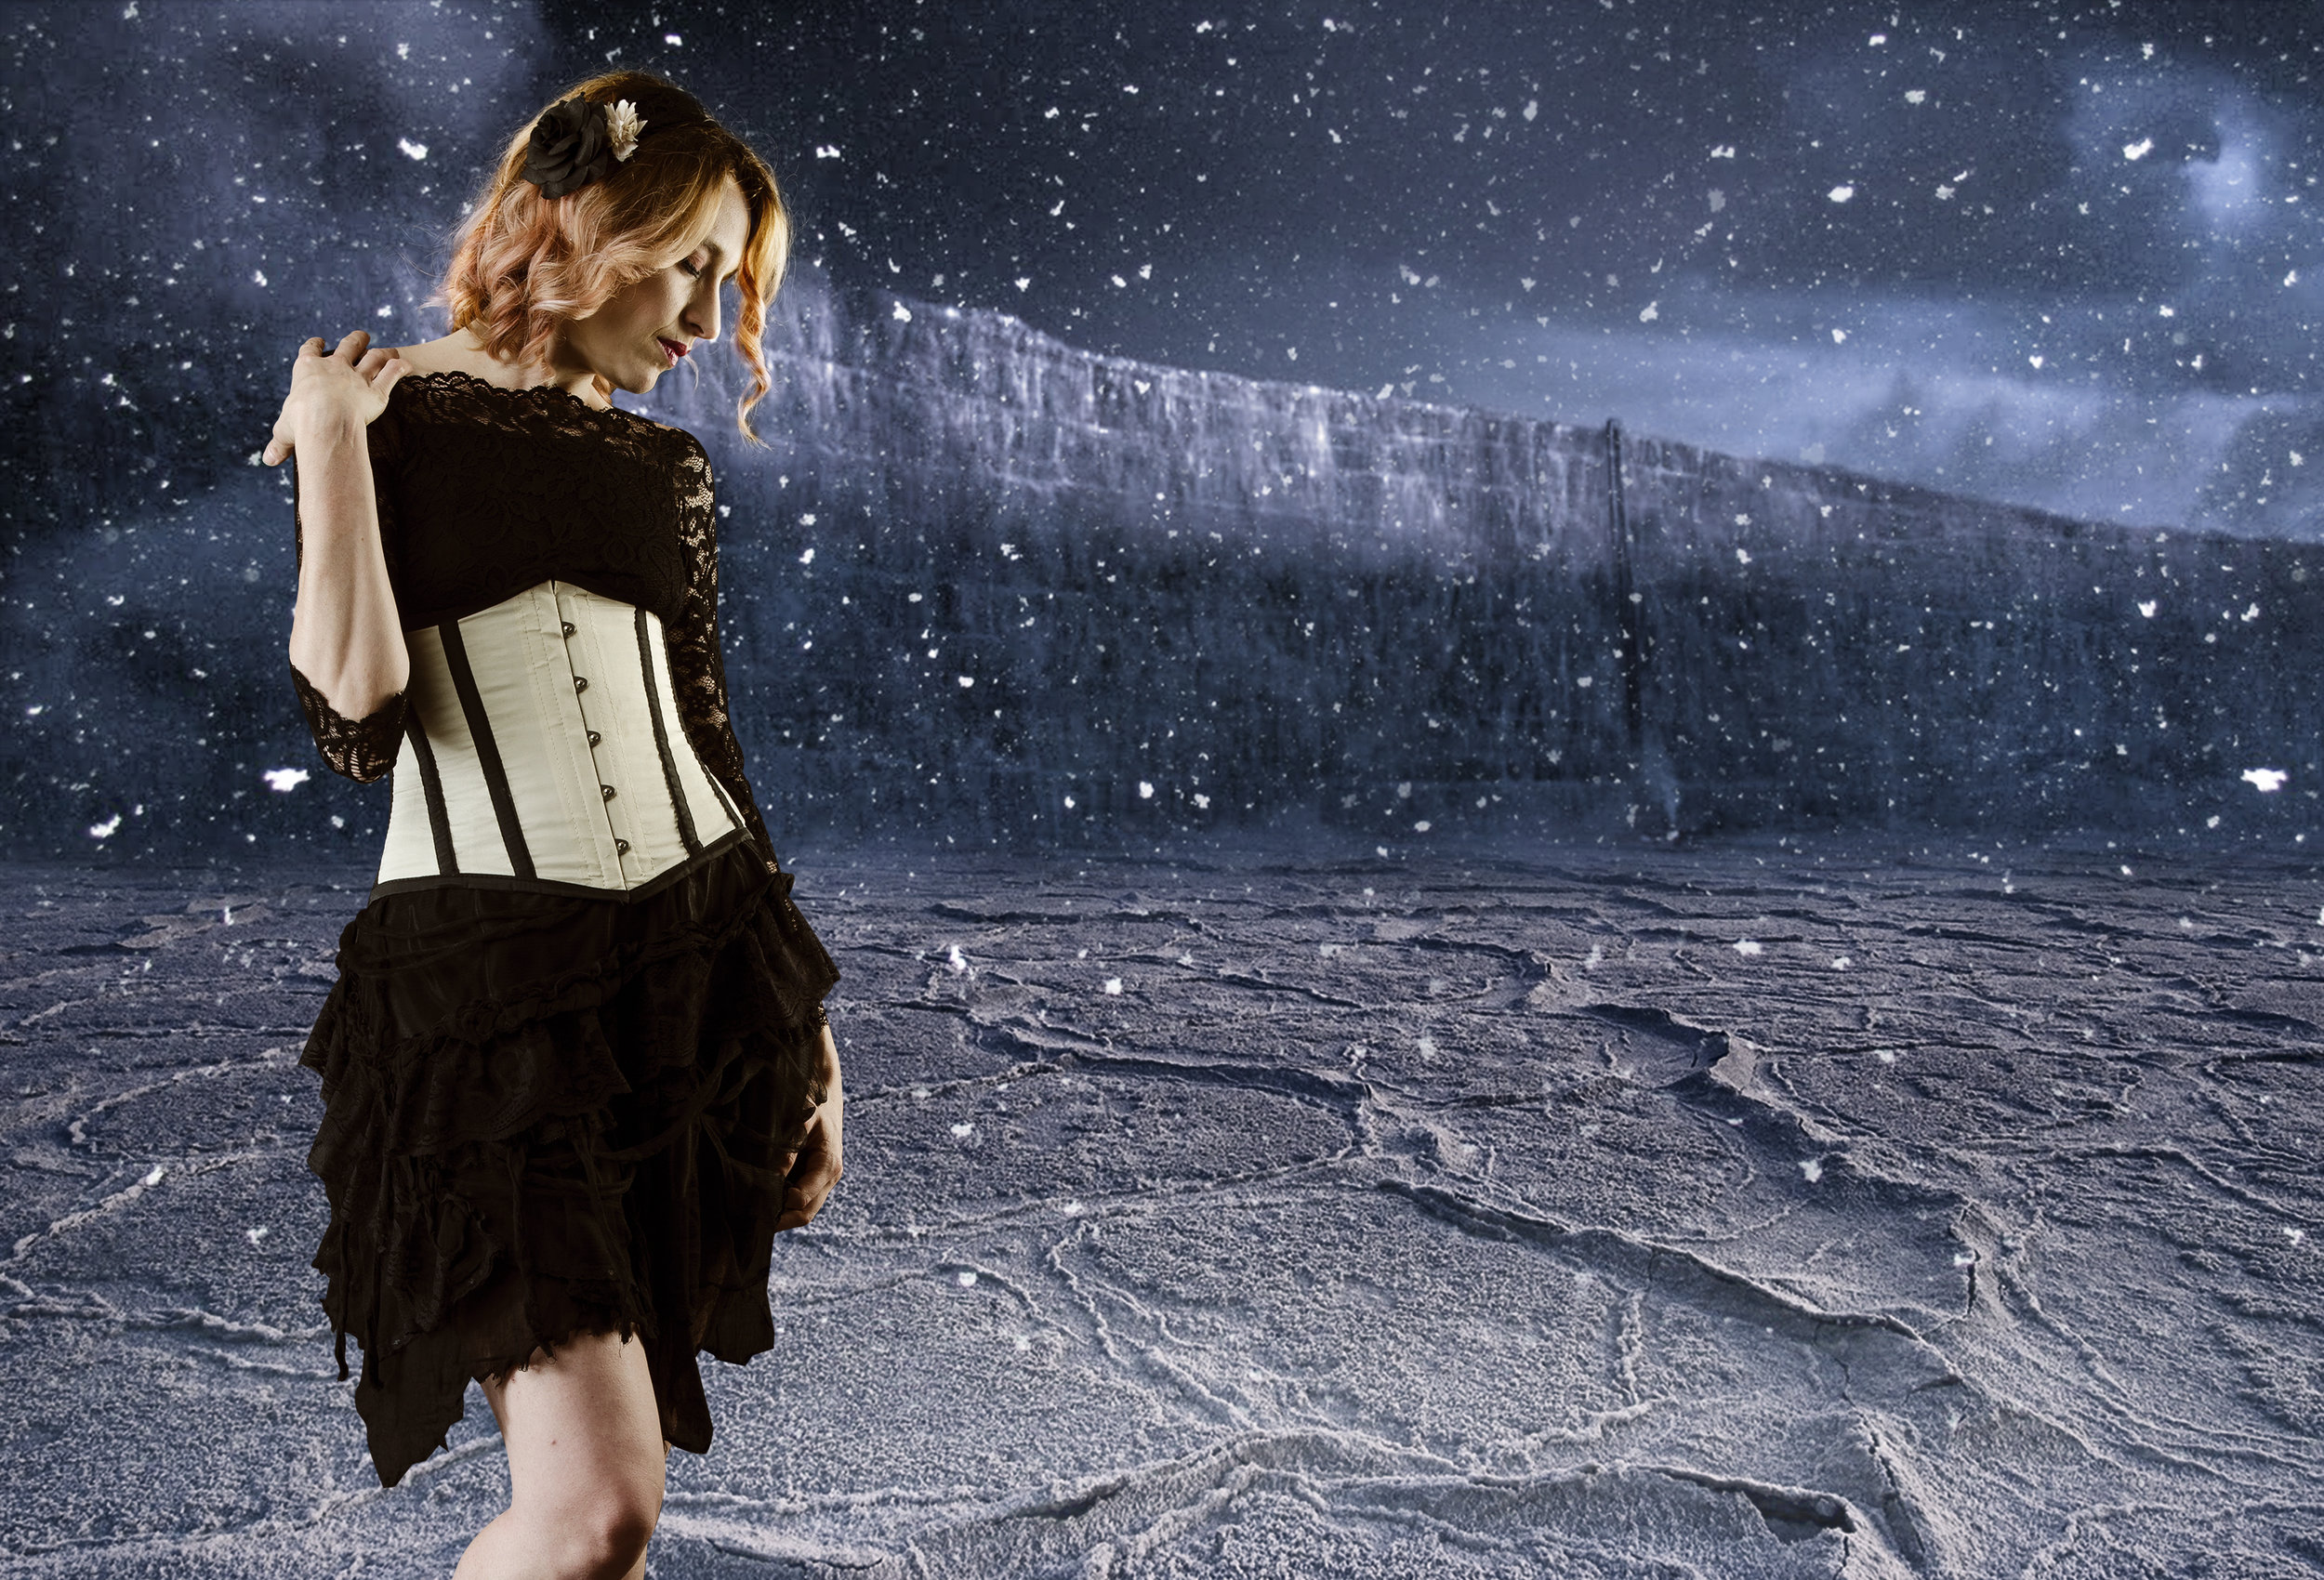 foto cosplay book artwork fantasy fotografo grafico